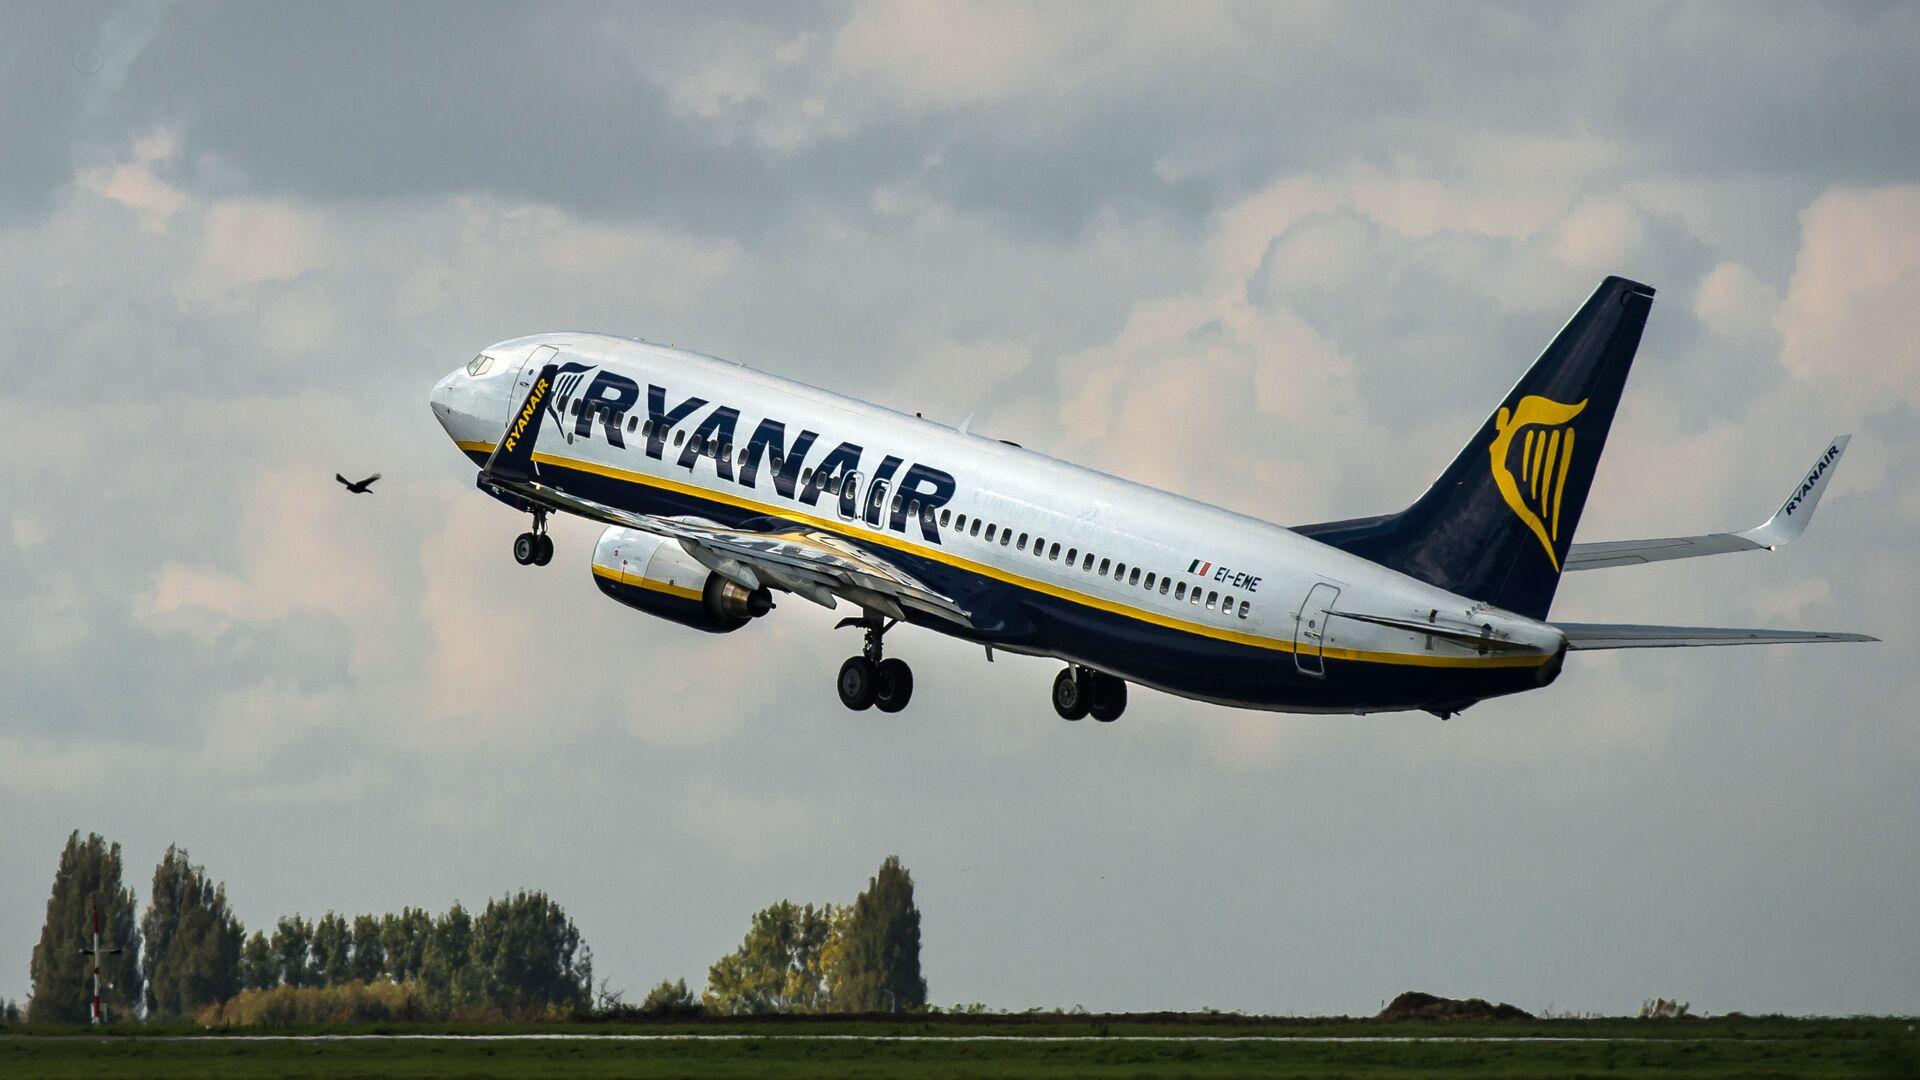 Самолет авиакомпании Ryanair  - Sputnik Česká republika, 1920, 24.05.2021